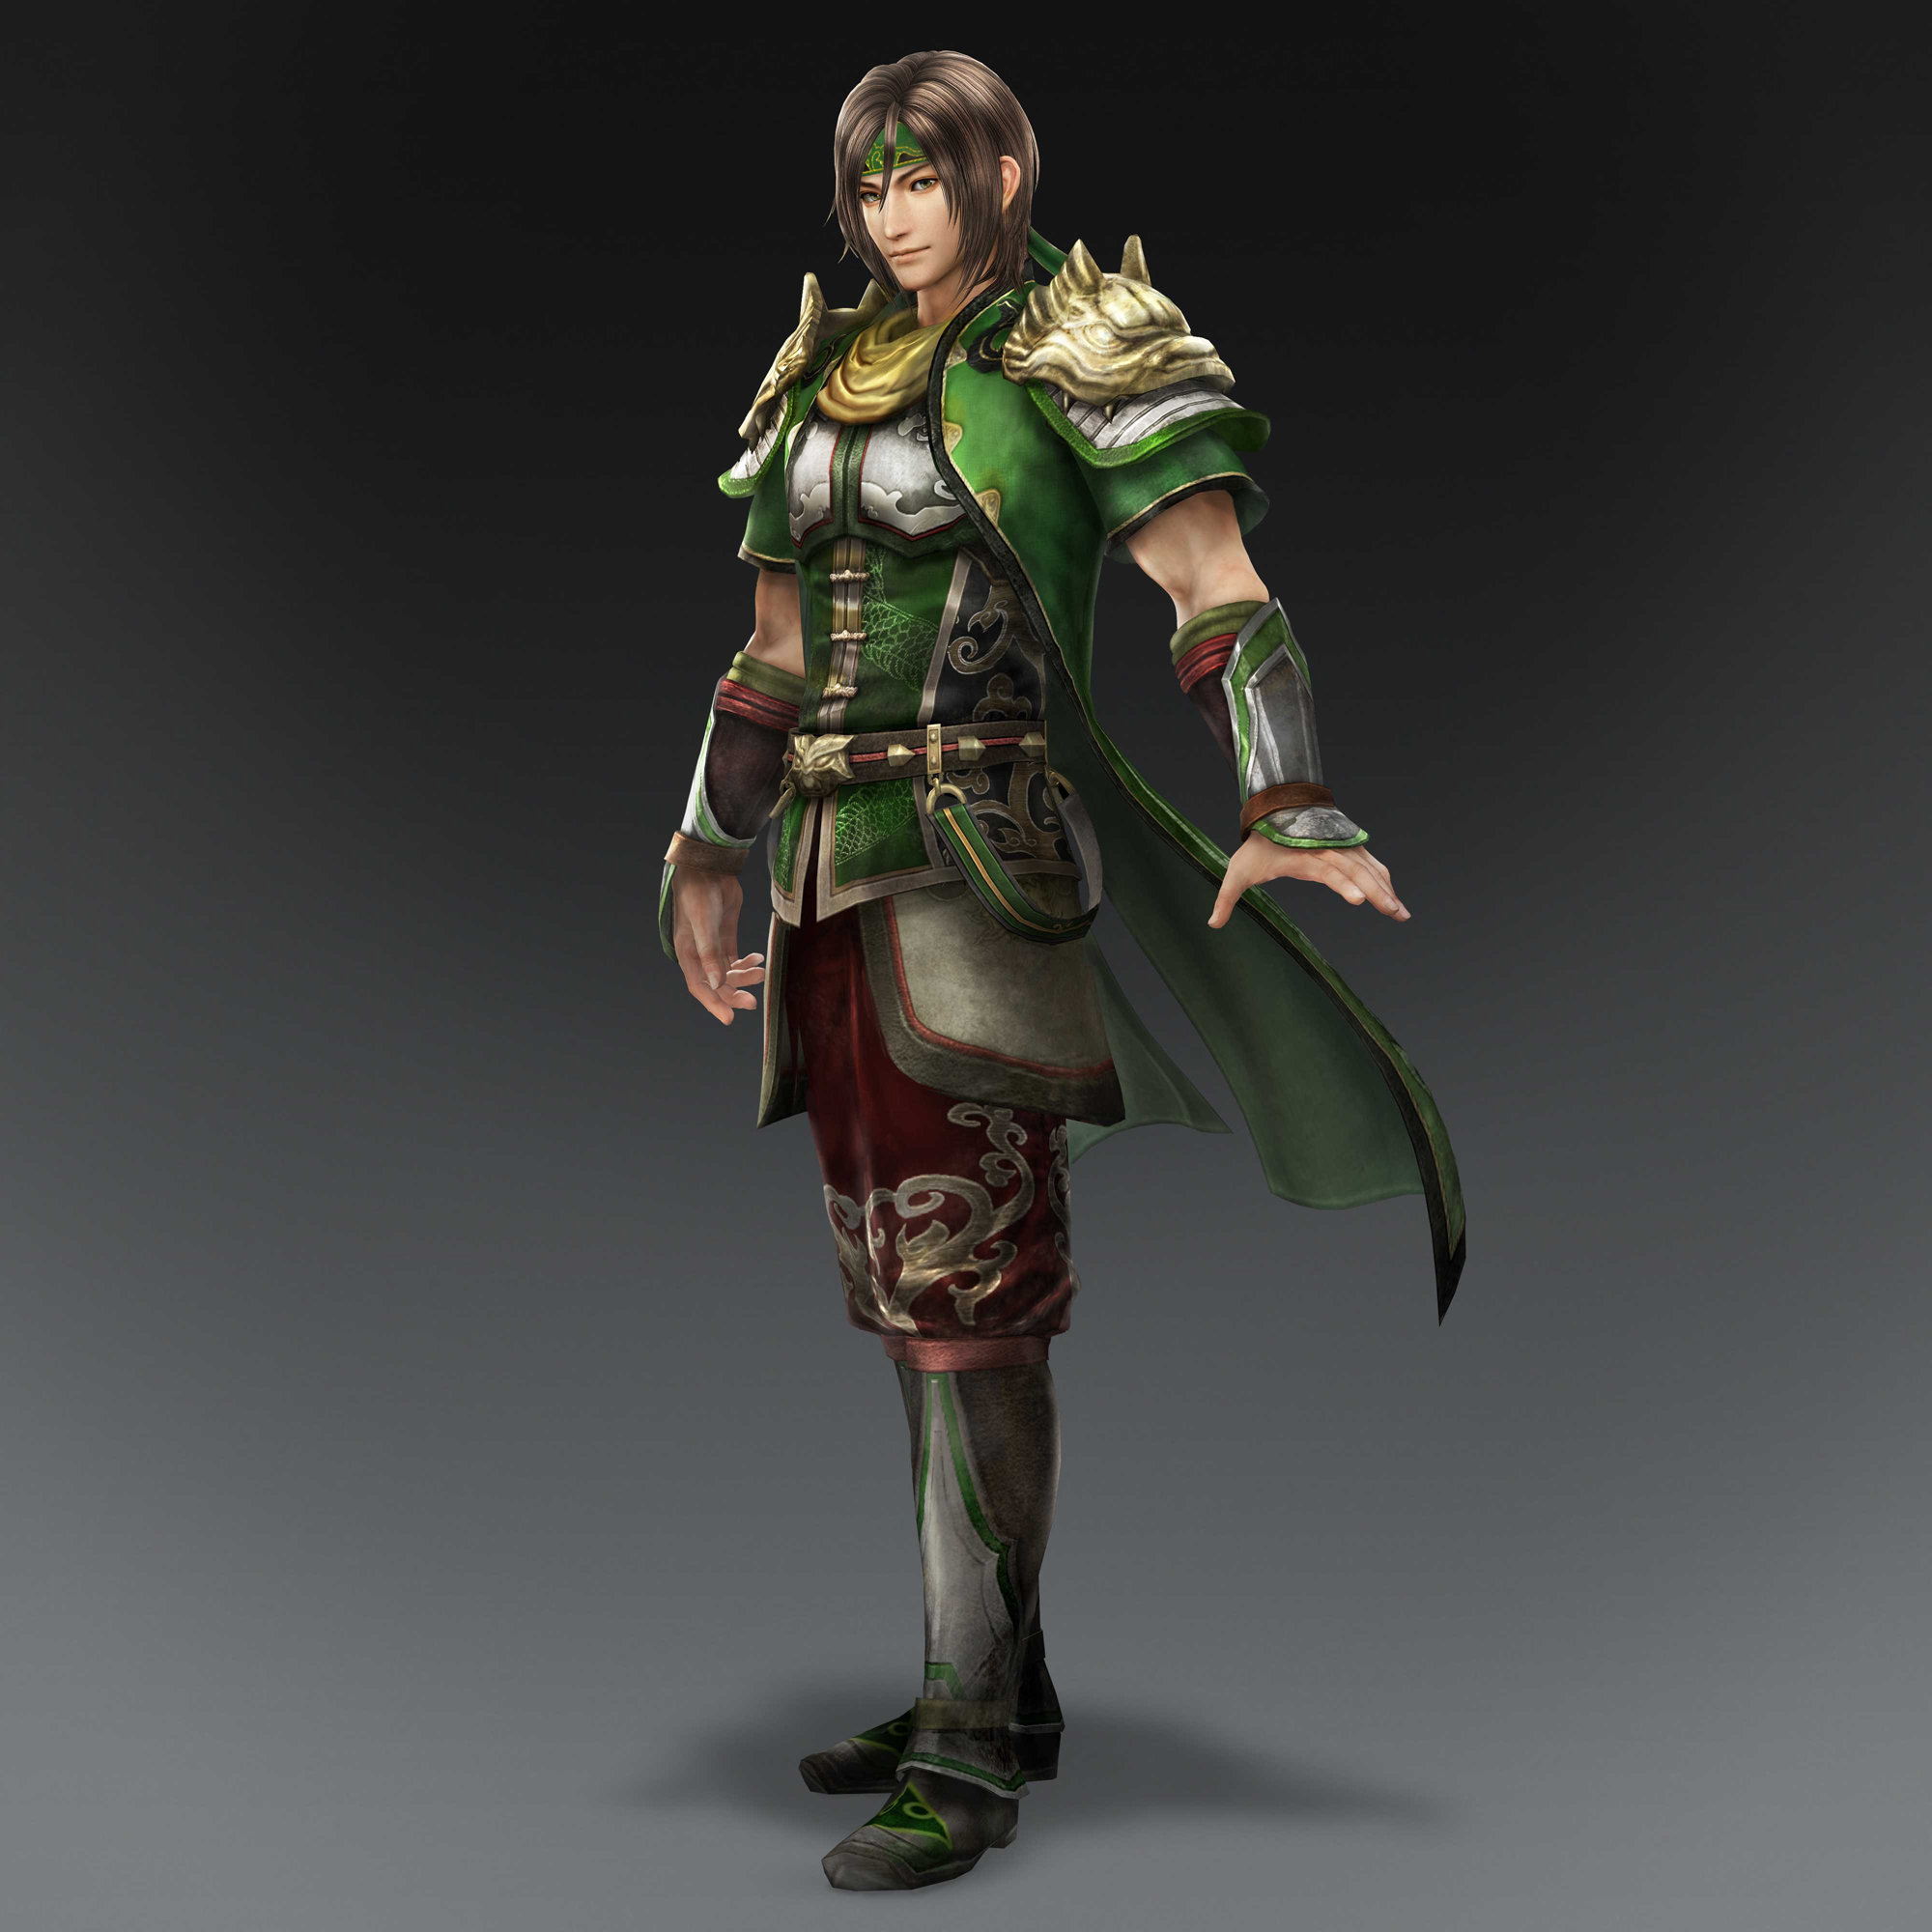 Guan Ping Dynasty Warriors 8